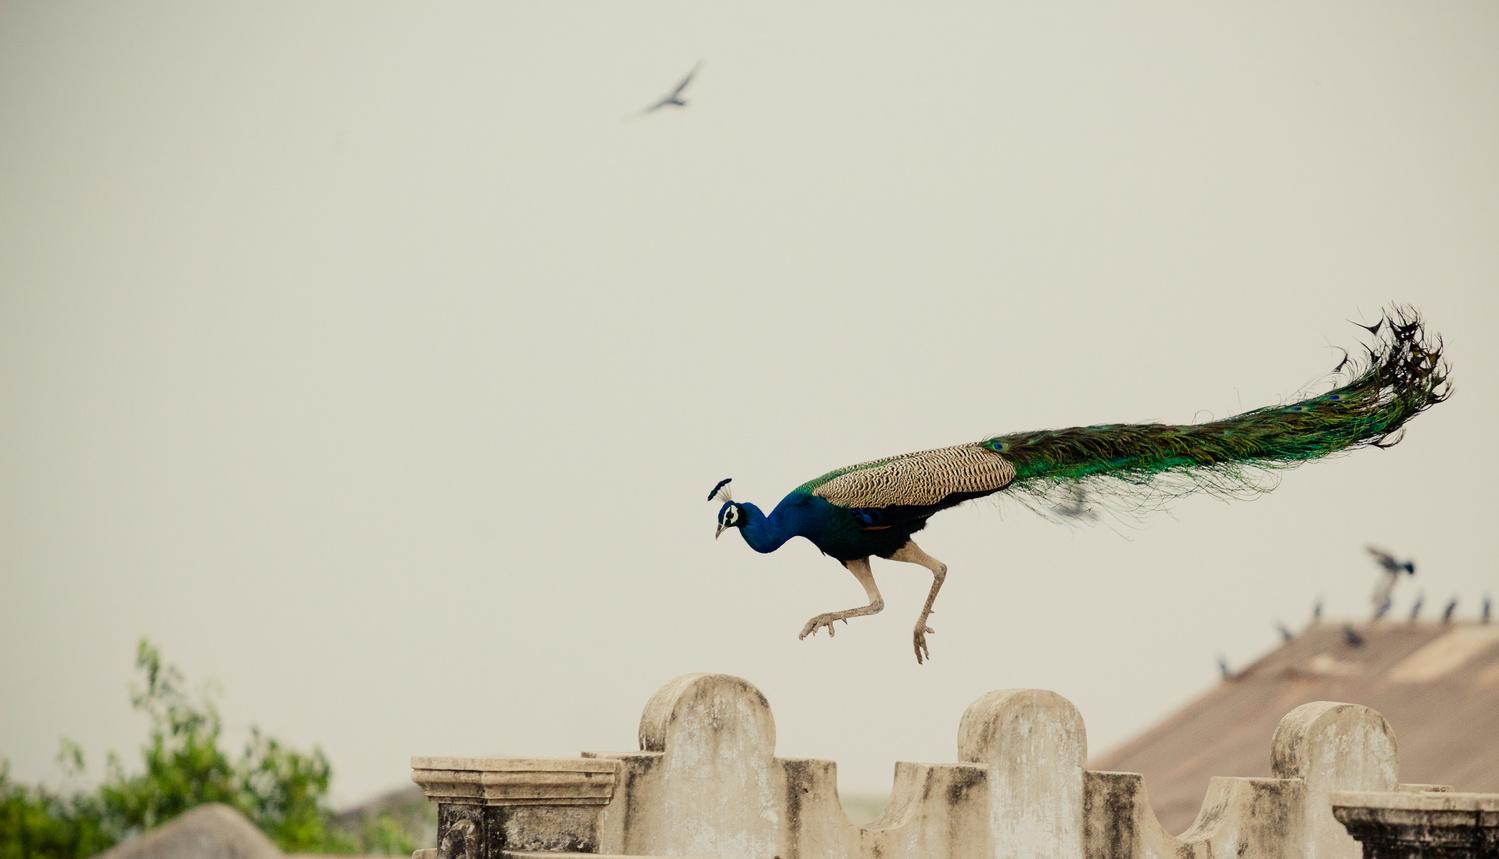 Jumping by Vivek Doshi